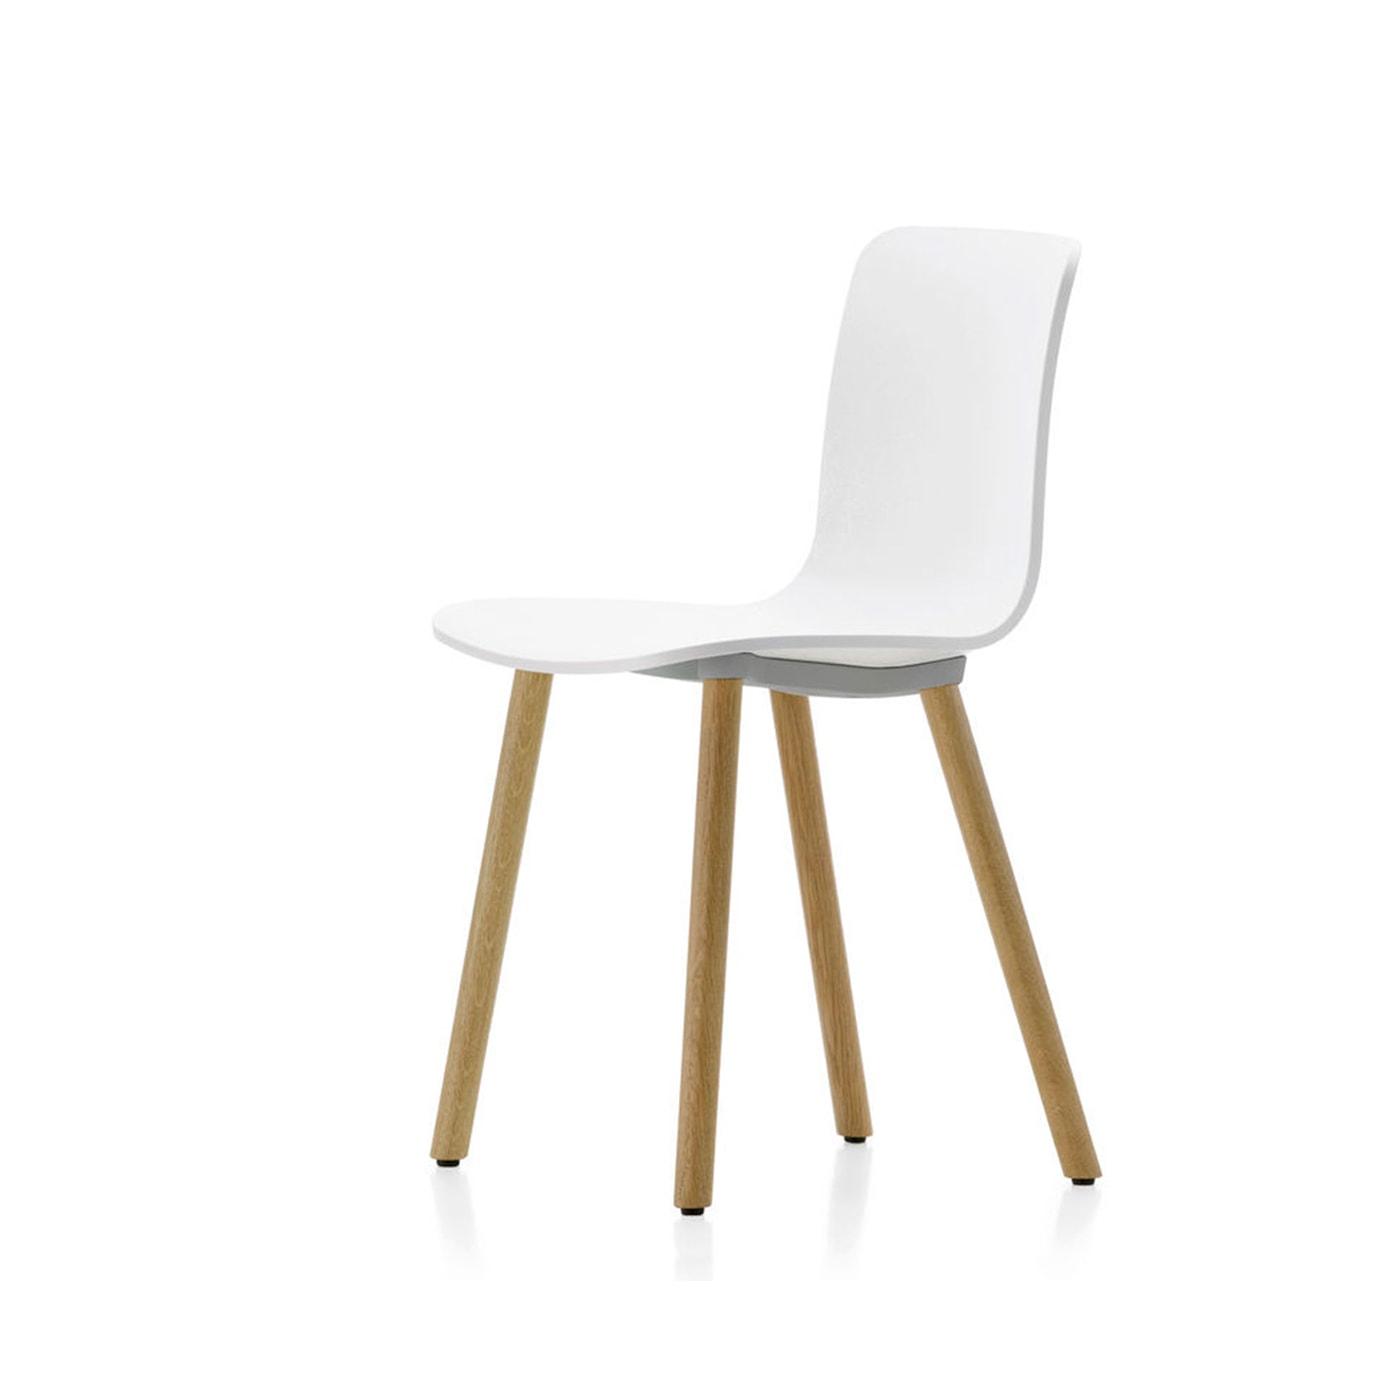 VITRA Hal Wood sedia gambe in legno